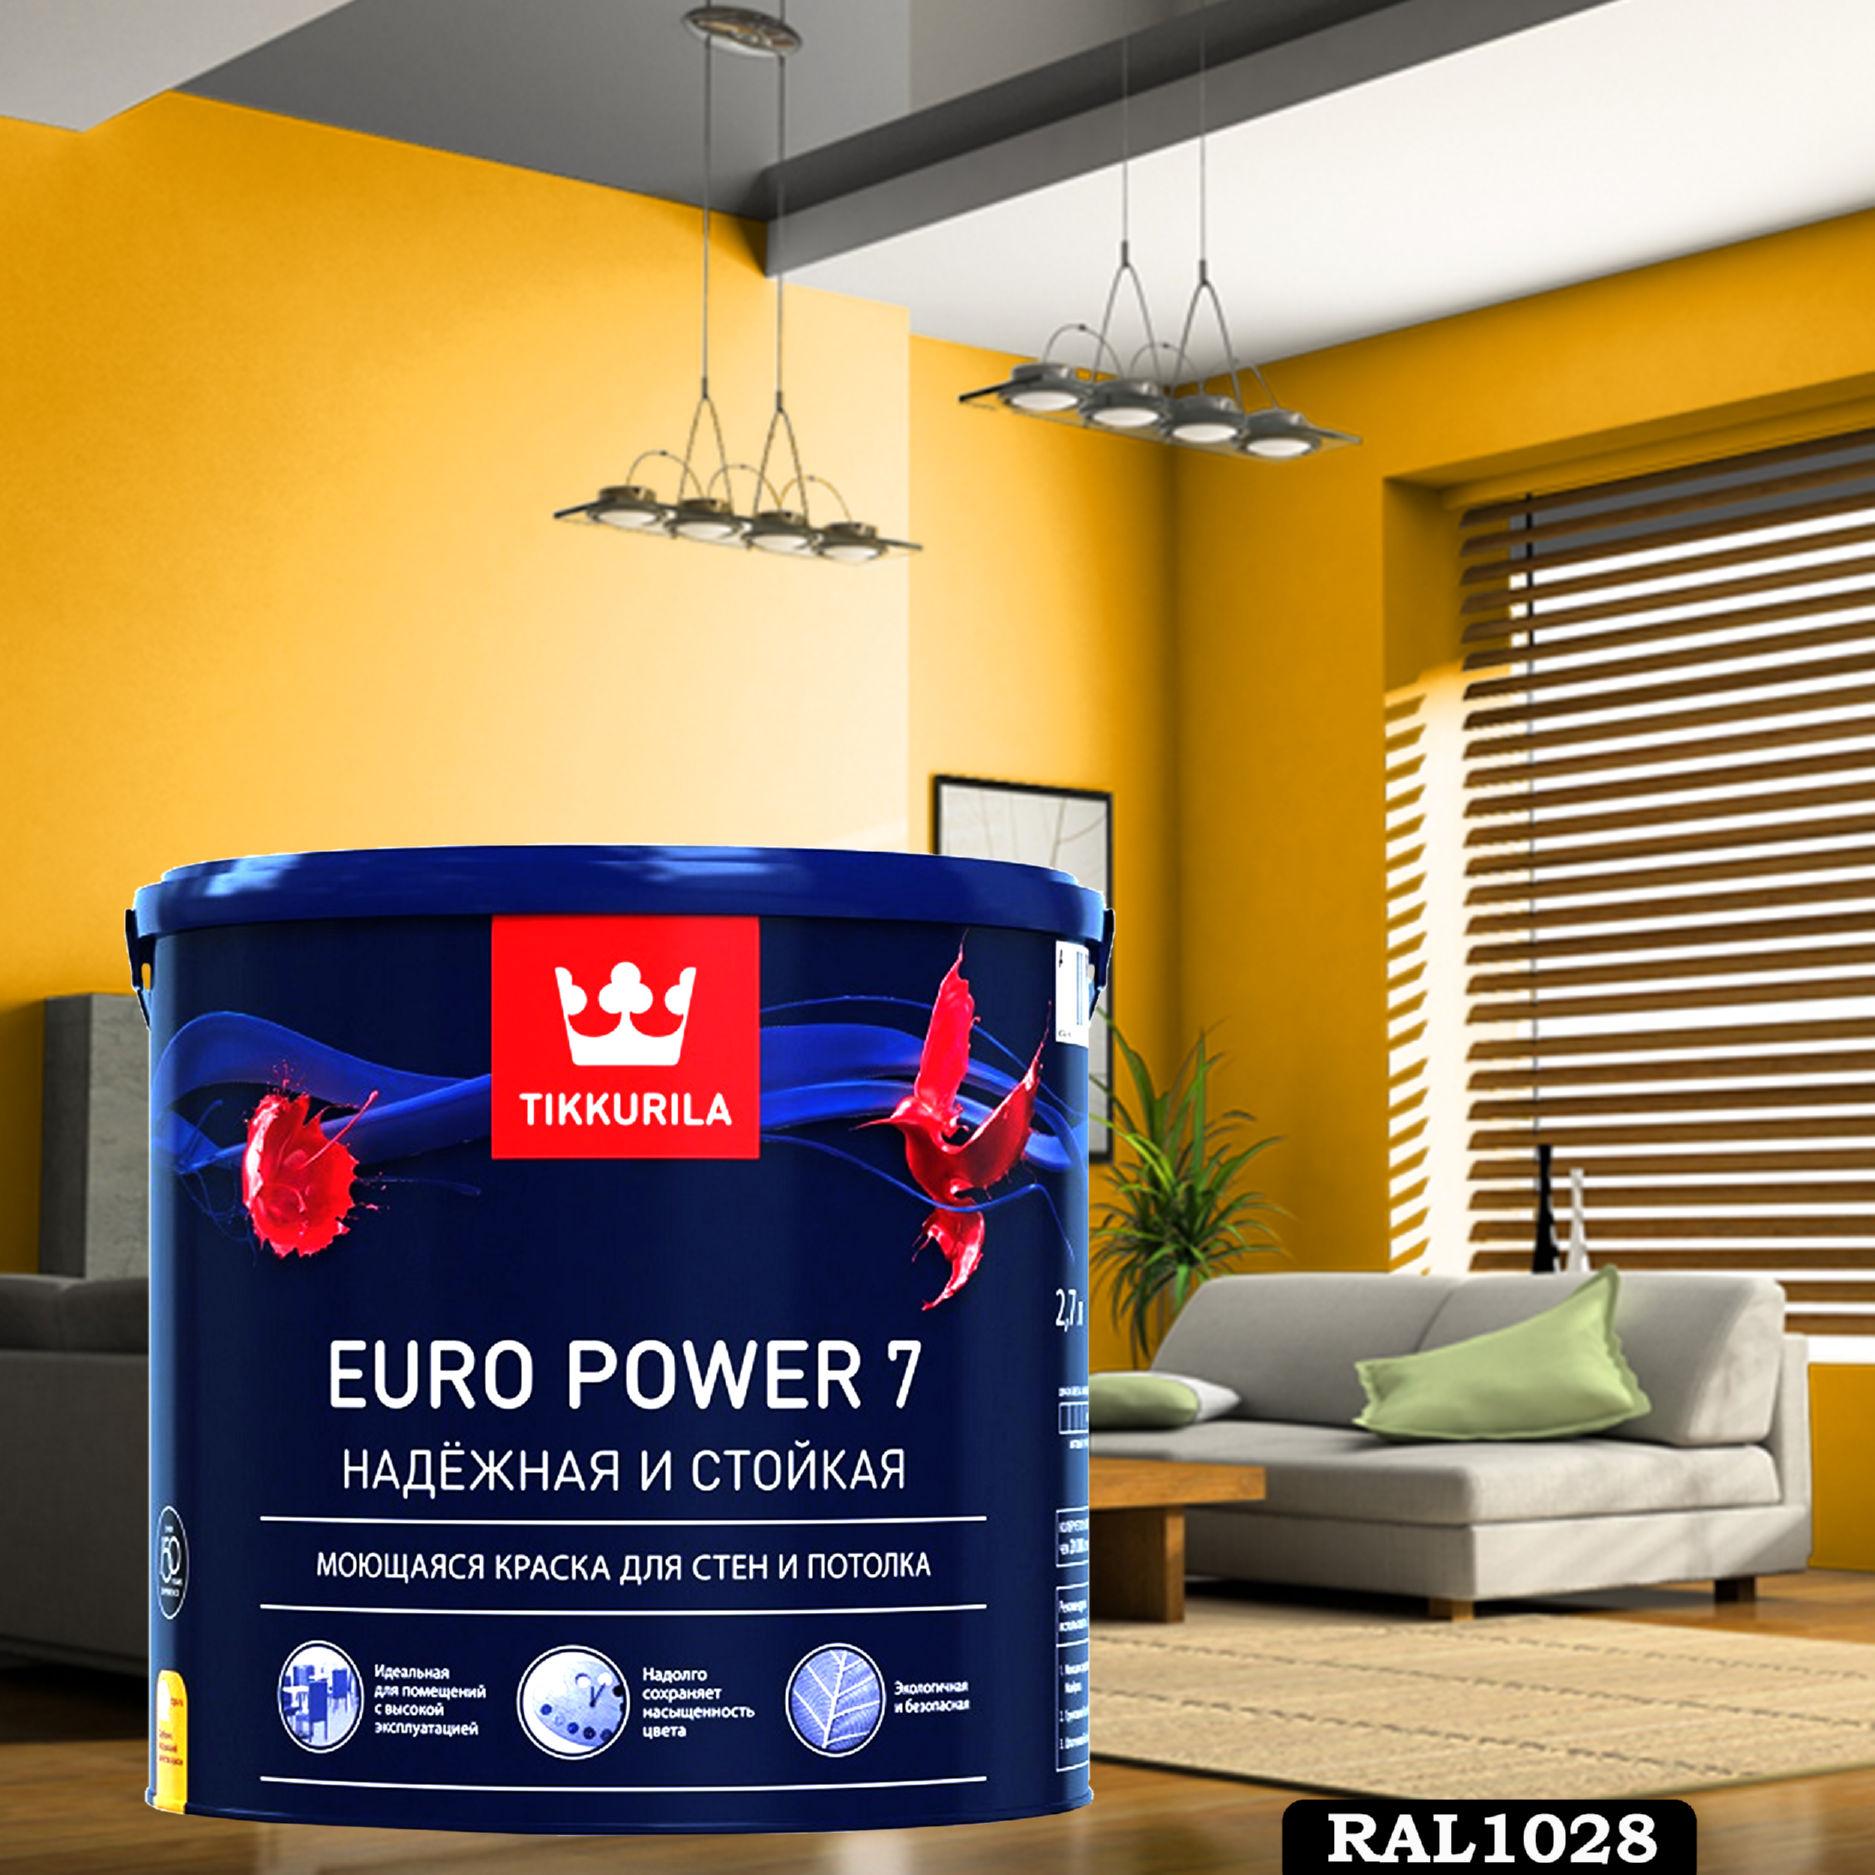 Фото 23 - Краска TIKKURILA Euro Power 7,  RAL 1028 Жёлтая-дыня, латексная моющаяся матовая интерьерная, 9 л.